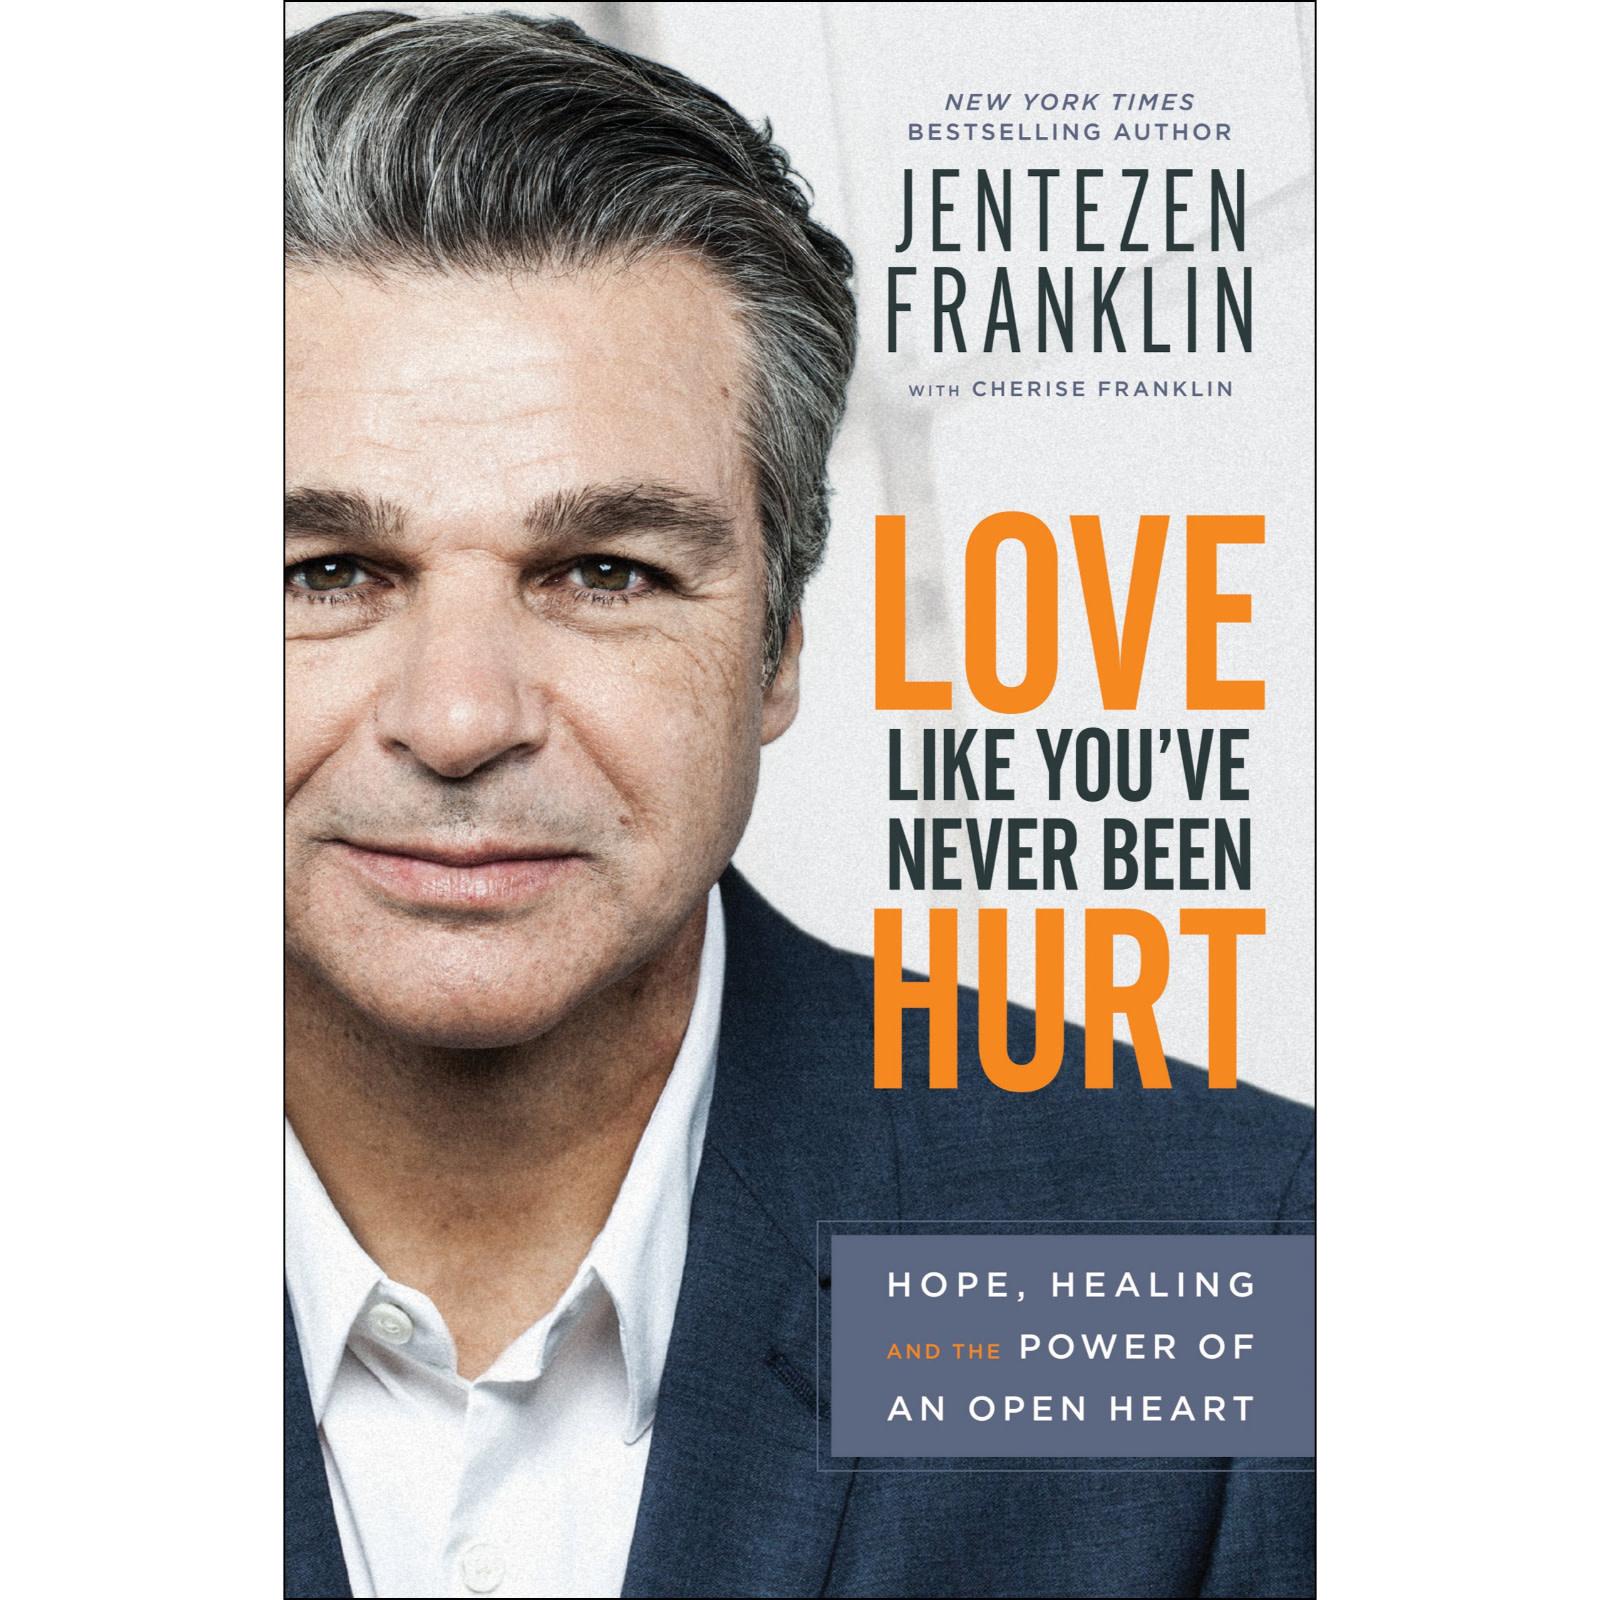 Jentzen Franklin Love Like You've Never Been Hurt: Hope, Healing and the Power of an Open Heart